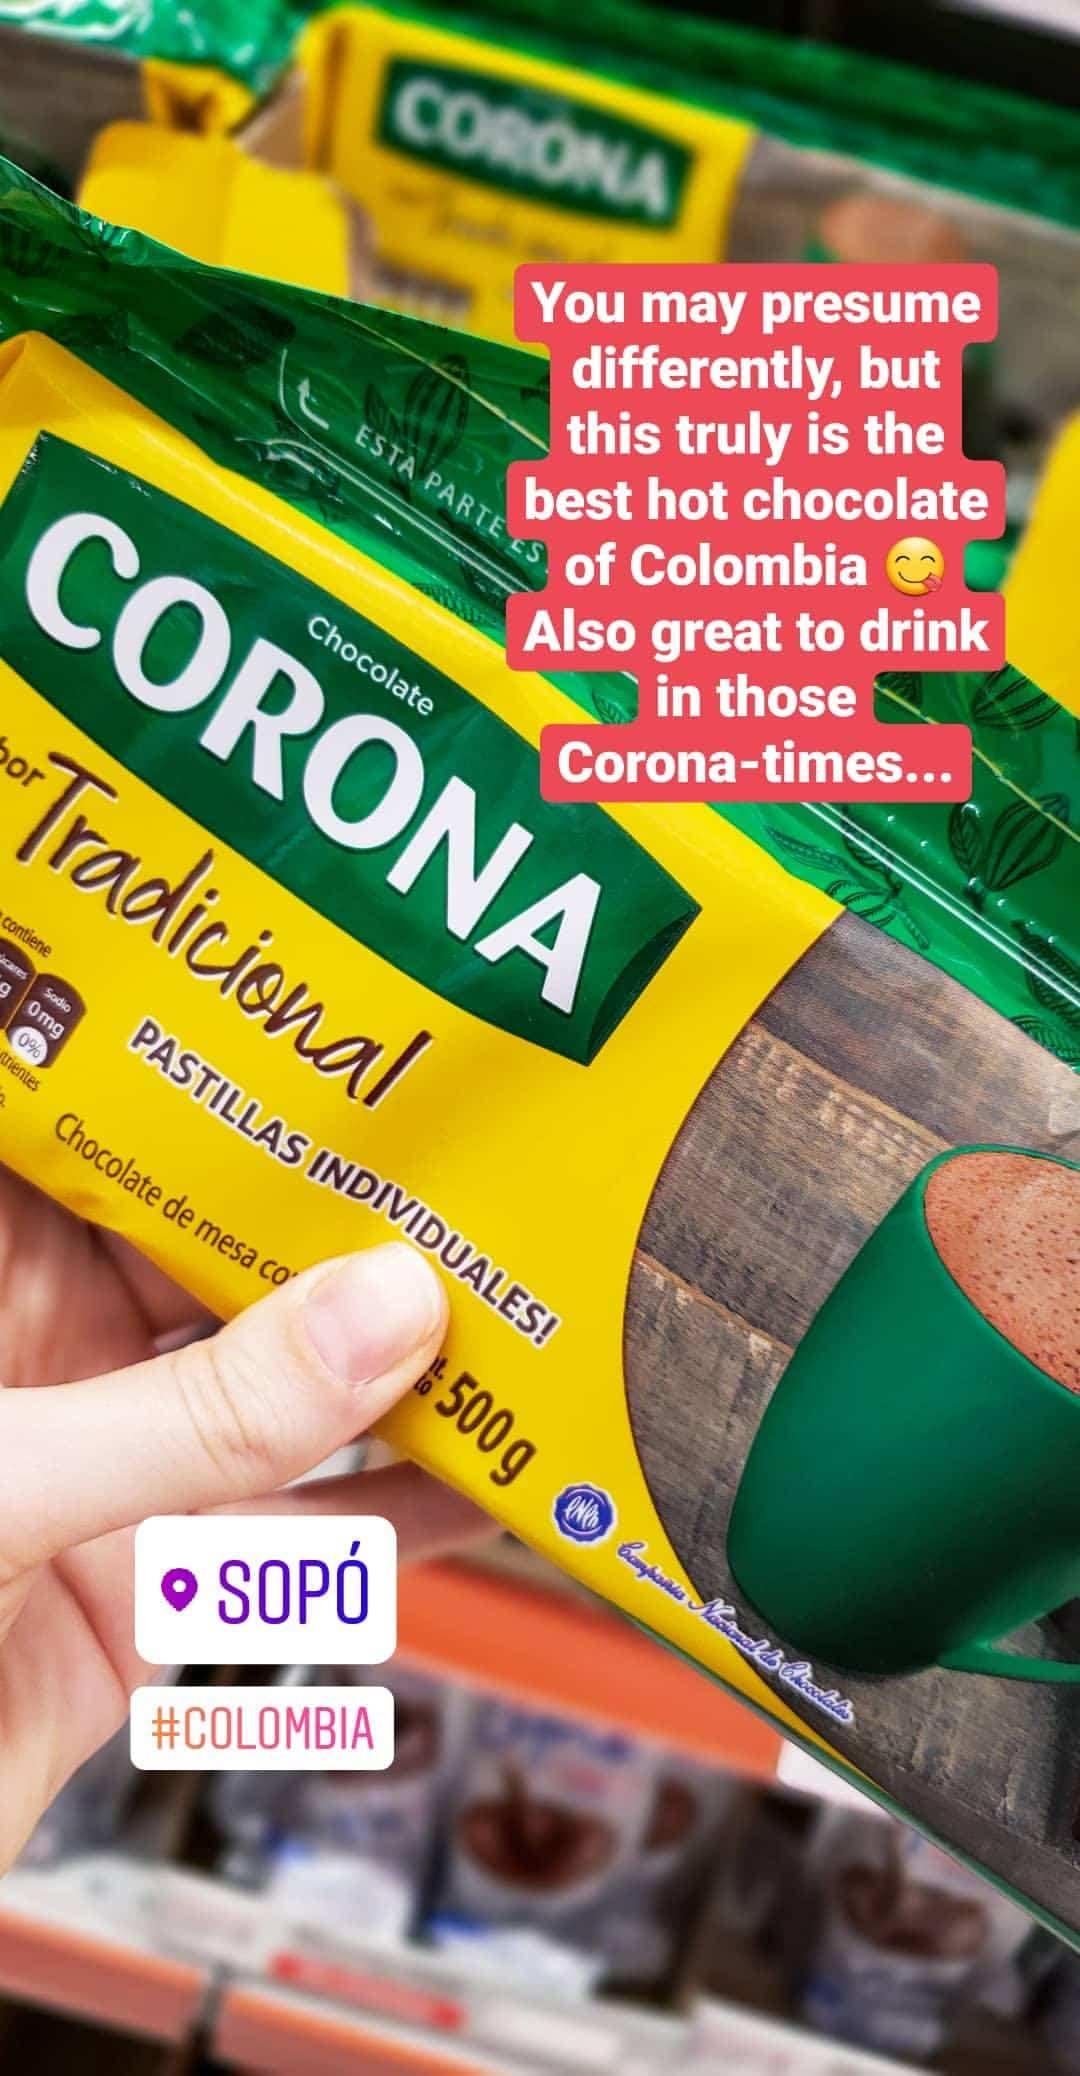 Nederlander in Colombia coronavirus